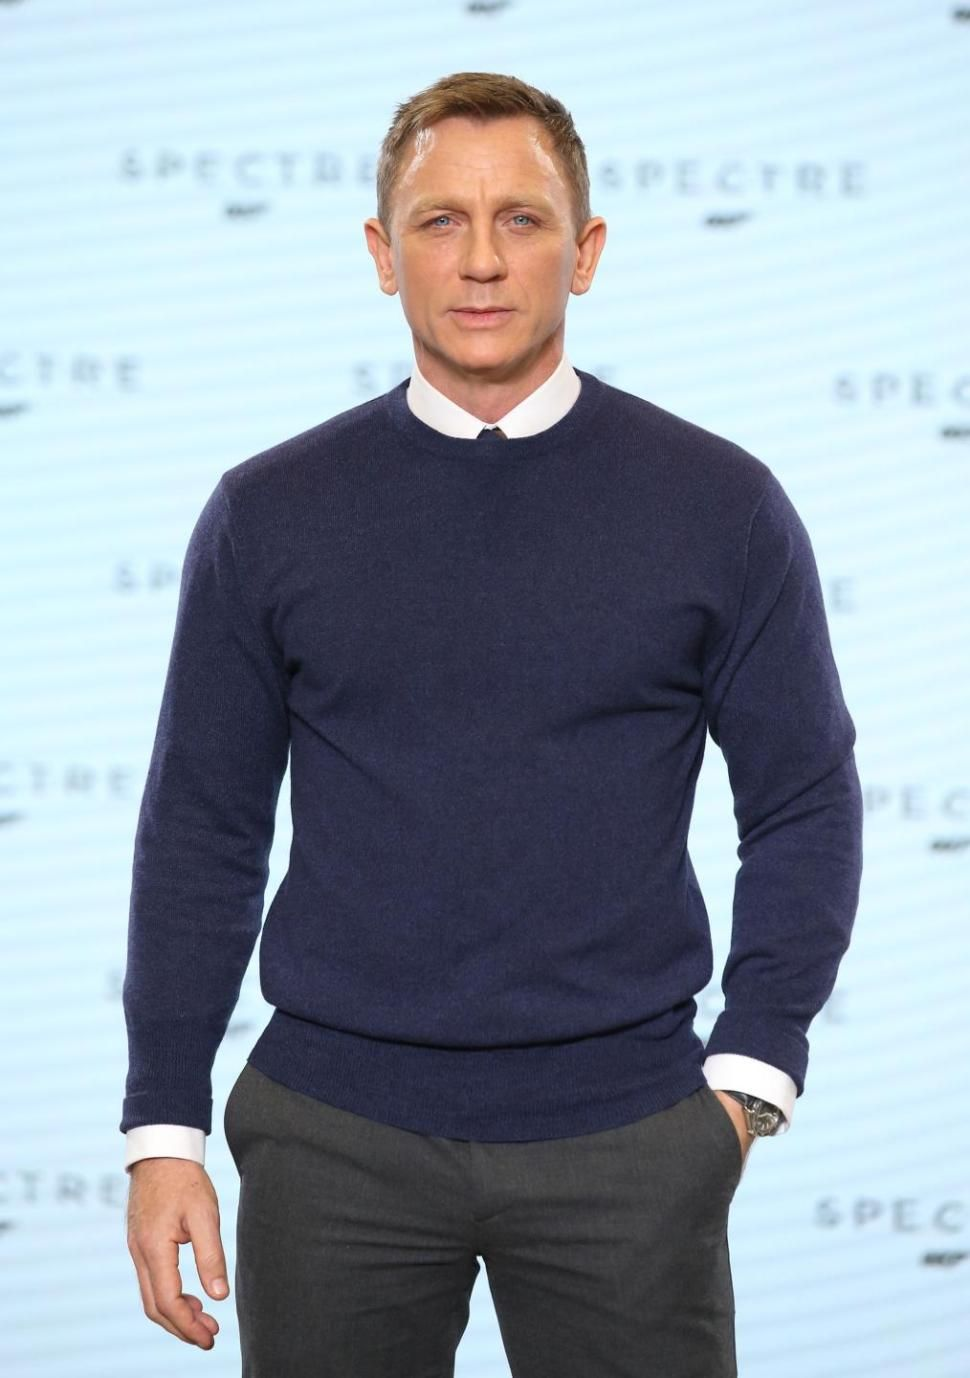 Daniel Craig back to work. Read more in : http://deadline.com